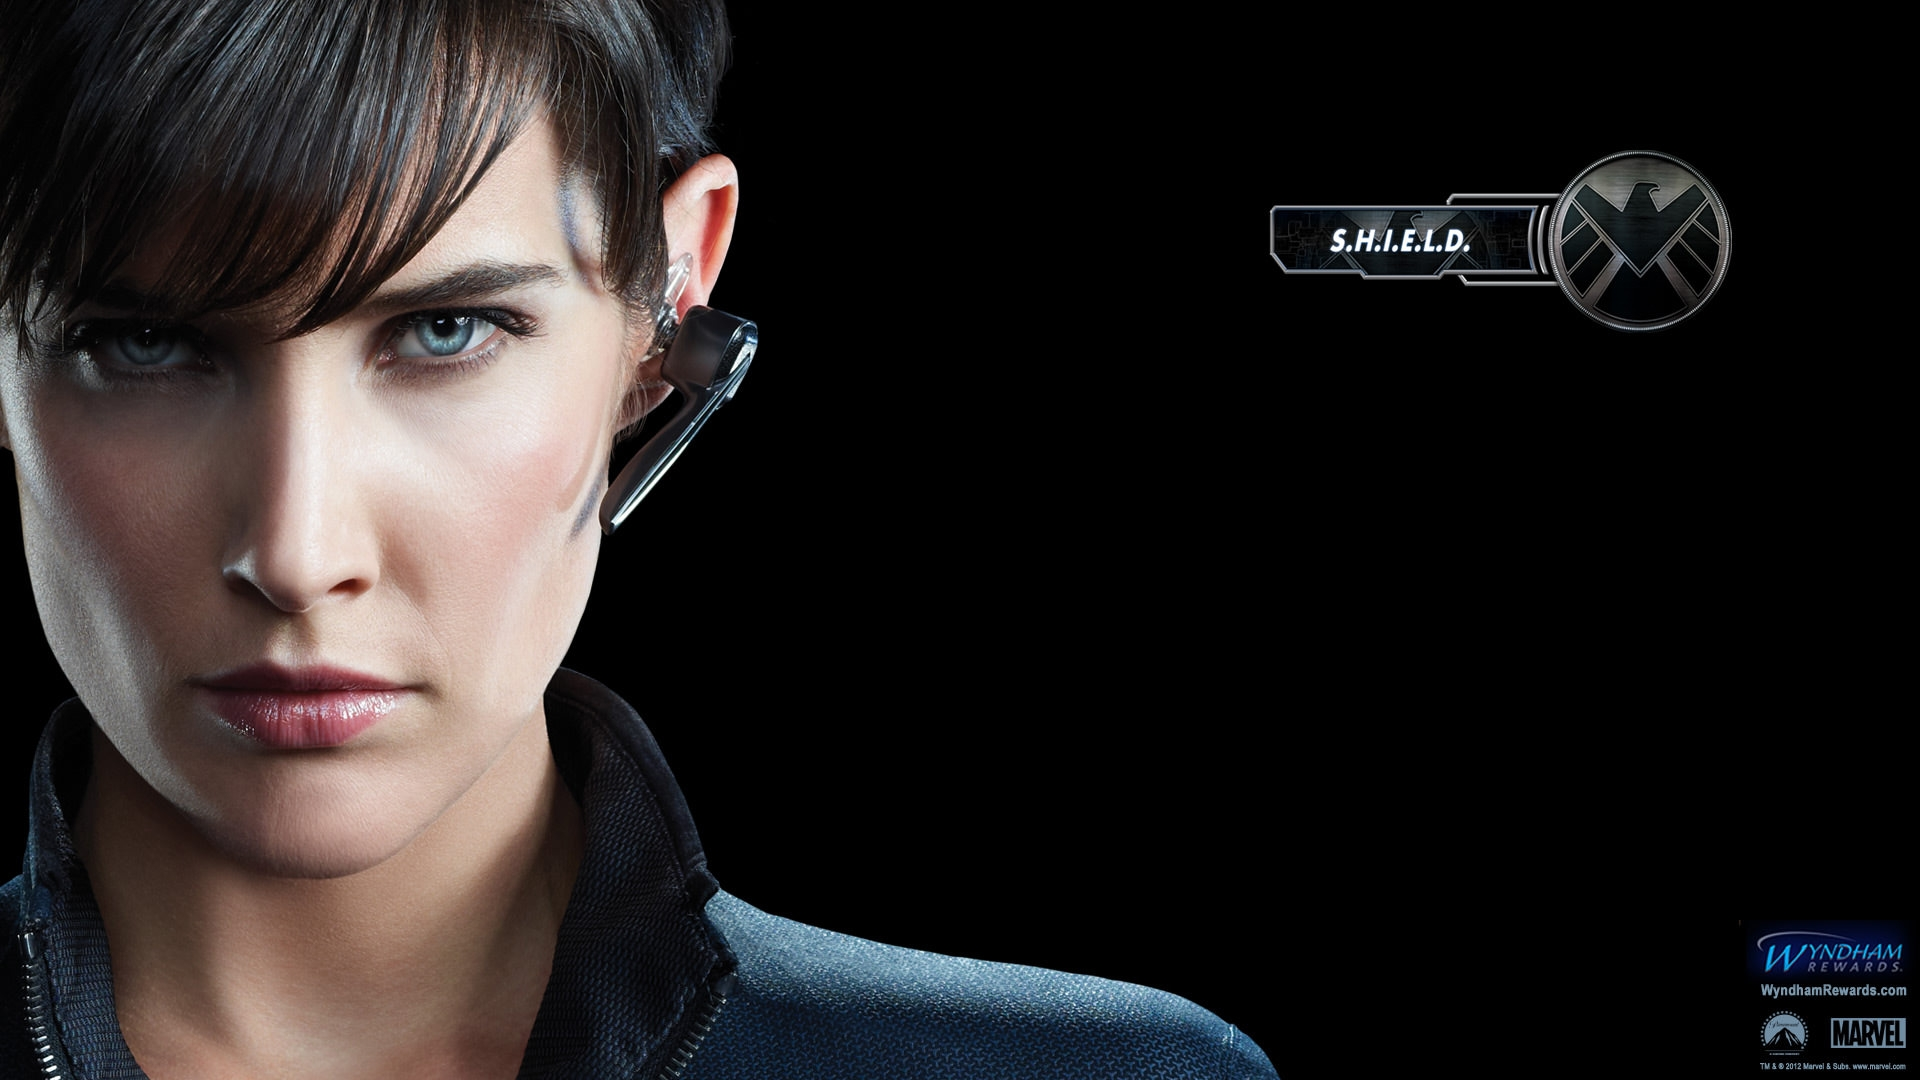 Cobie Smulders Avengers Wallpaper